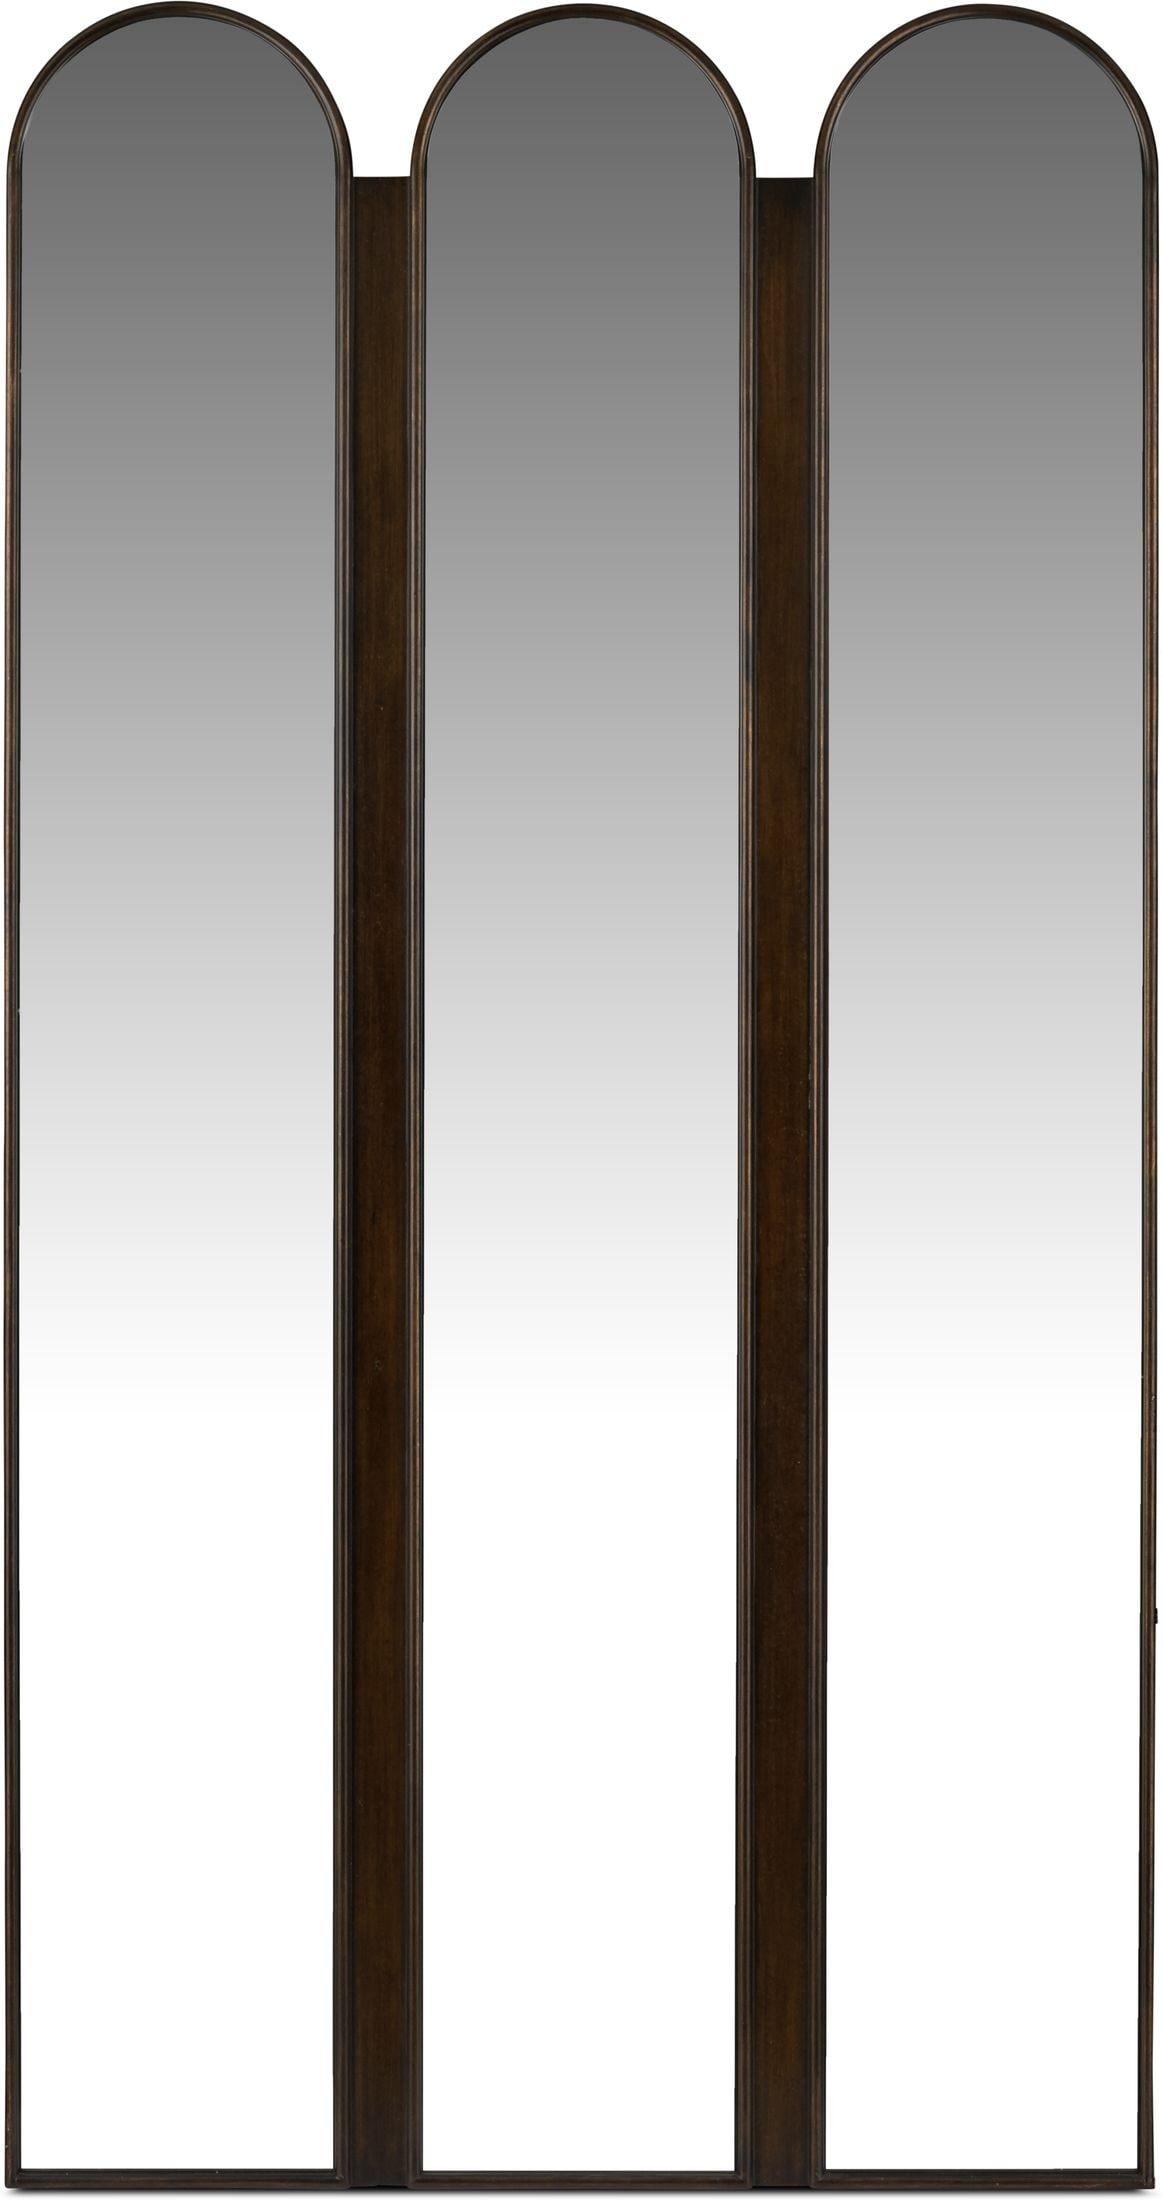 Home Accessories - Tri-panel Floor Mirror